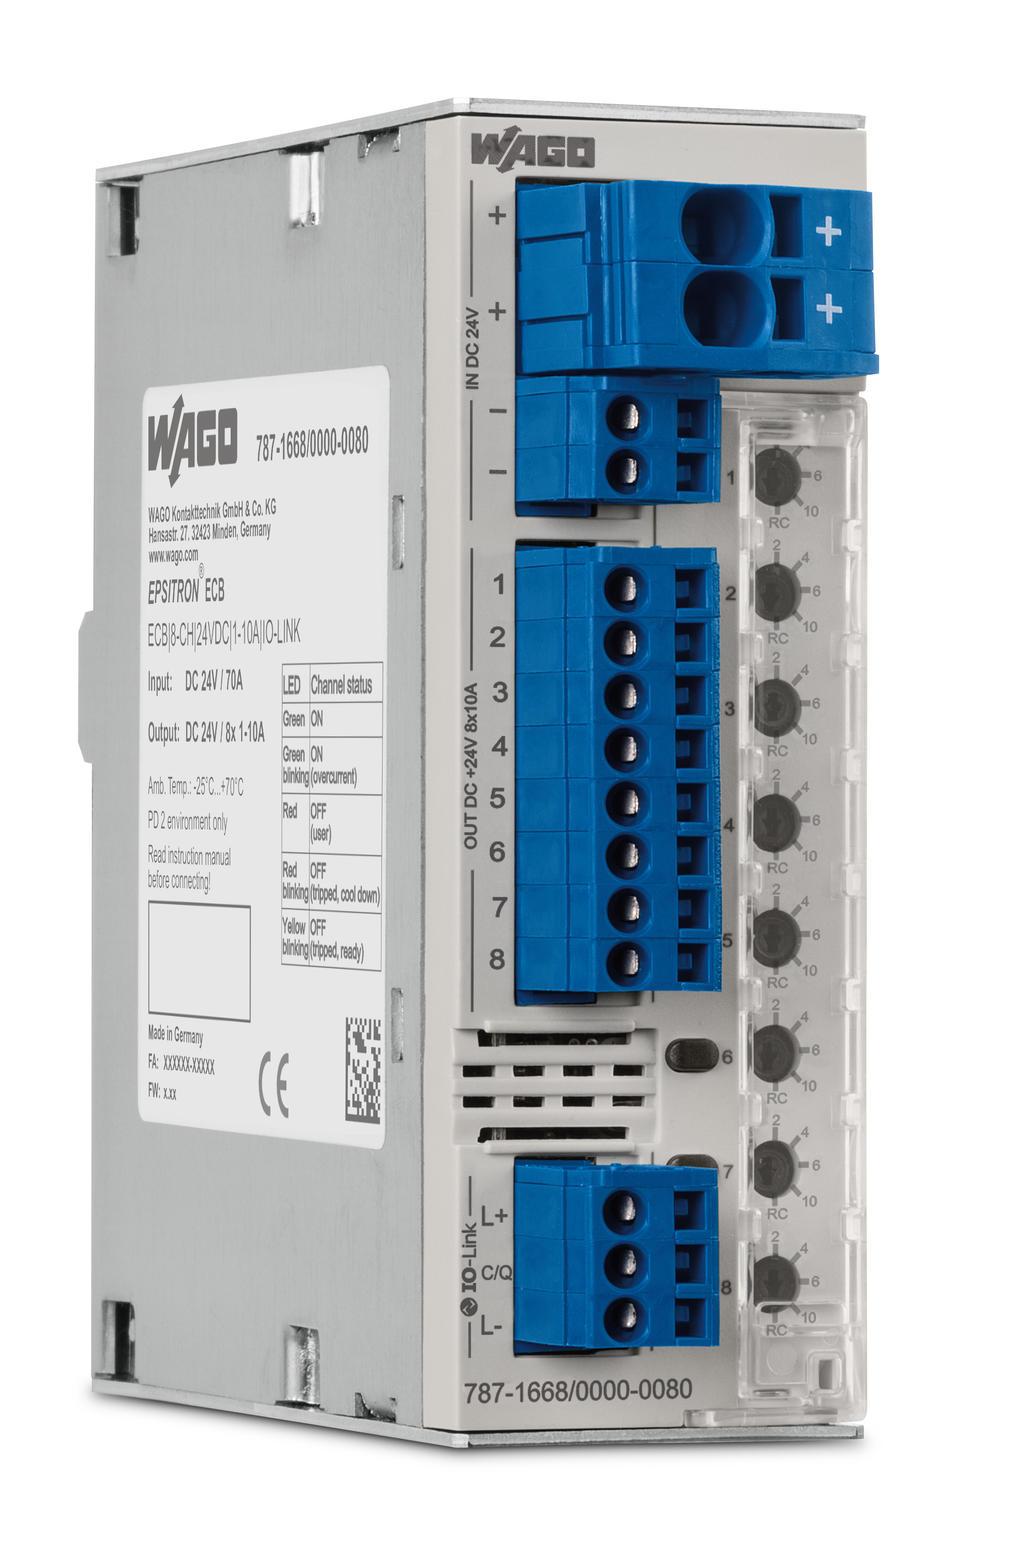 Wago Electronic Circuit Breaker 787 1668 000 080 Trippingcircuitbreakerpaneljpg 8 Channel 24 Vdc Input Voltage Adjustable 1 10 A Io Link